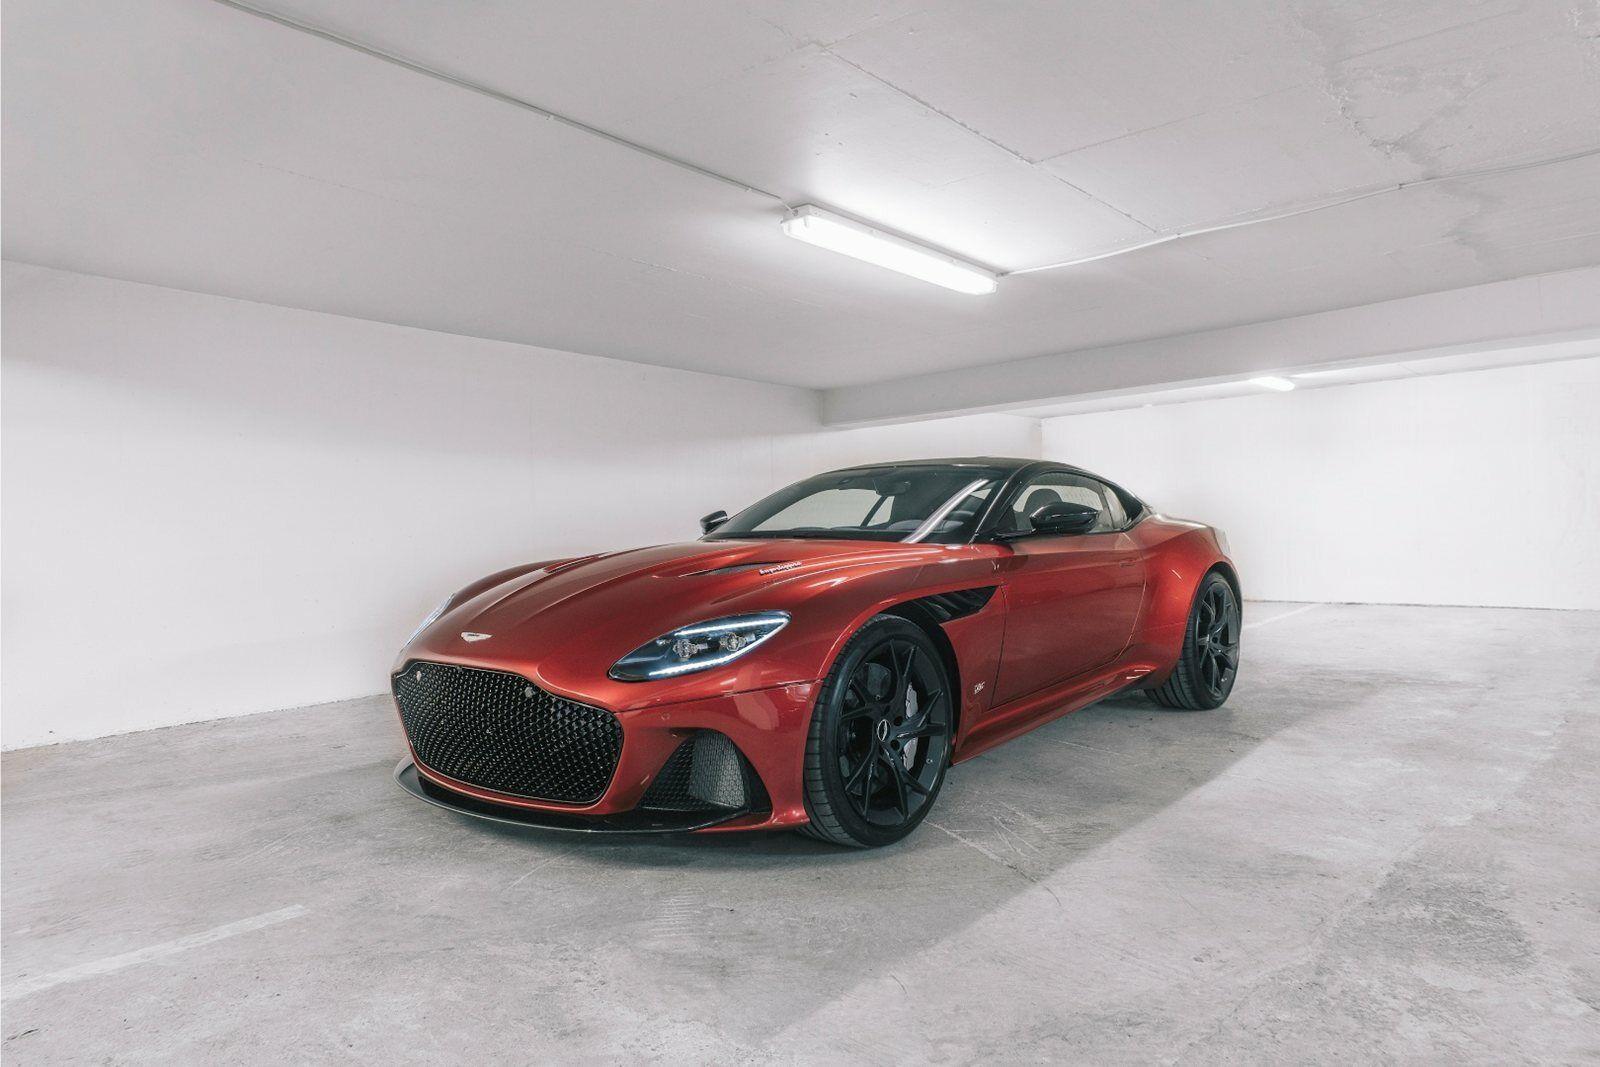 Aston Martin DBS 5,2 Superleggera aut. 2d